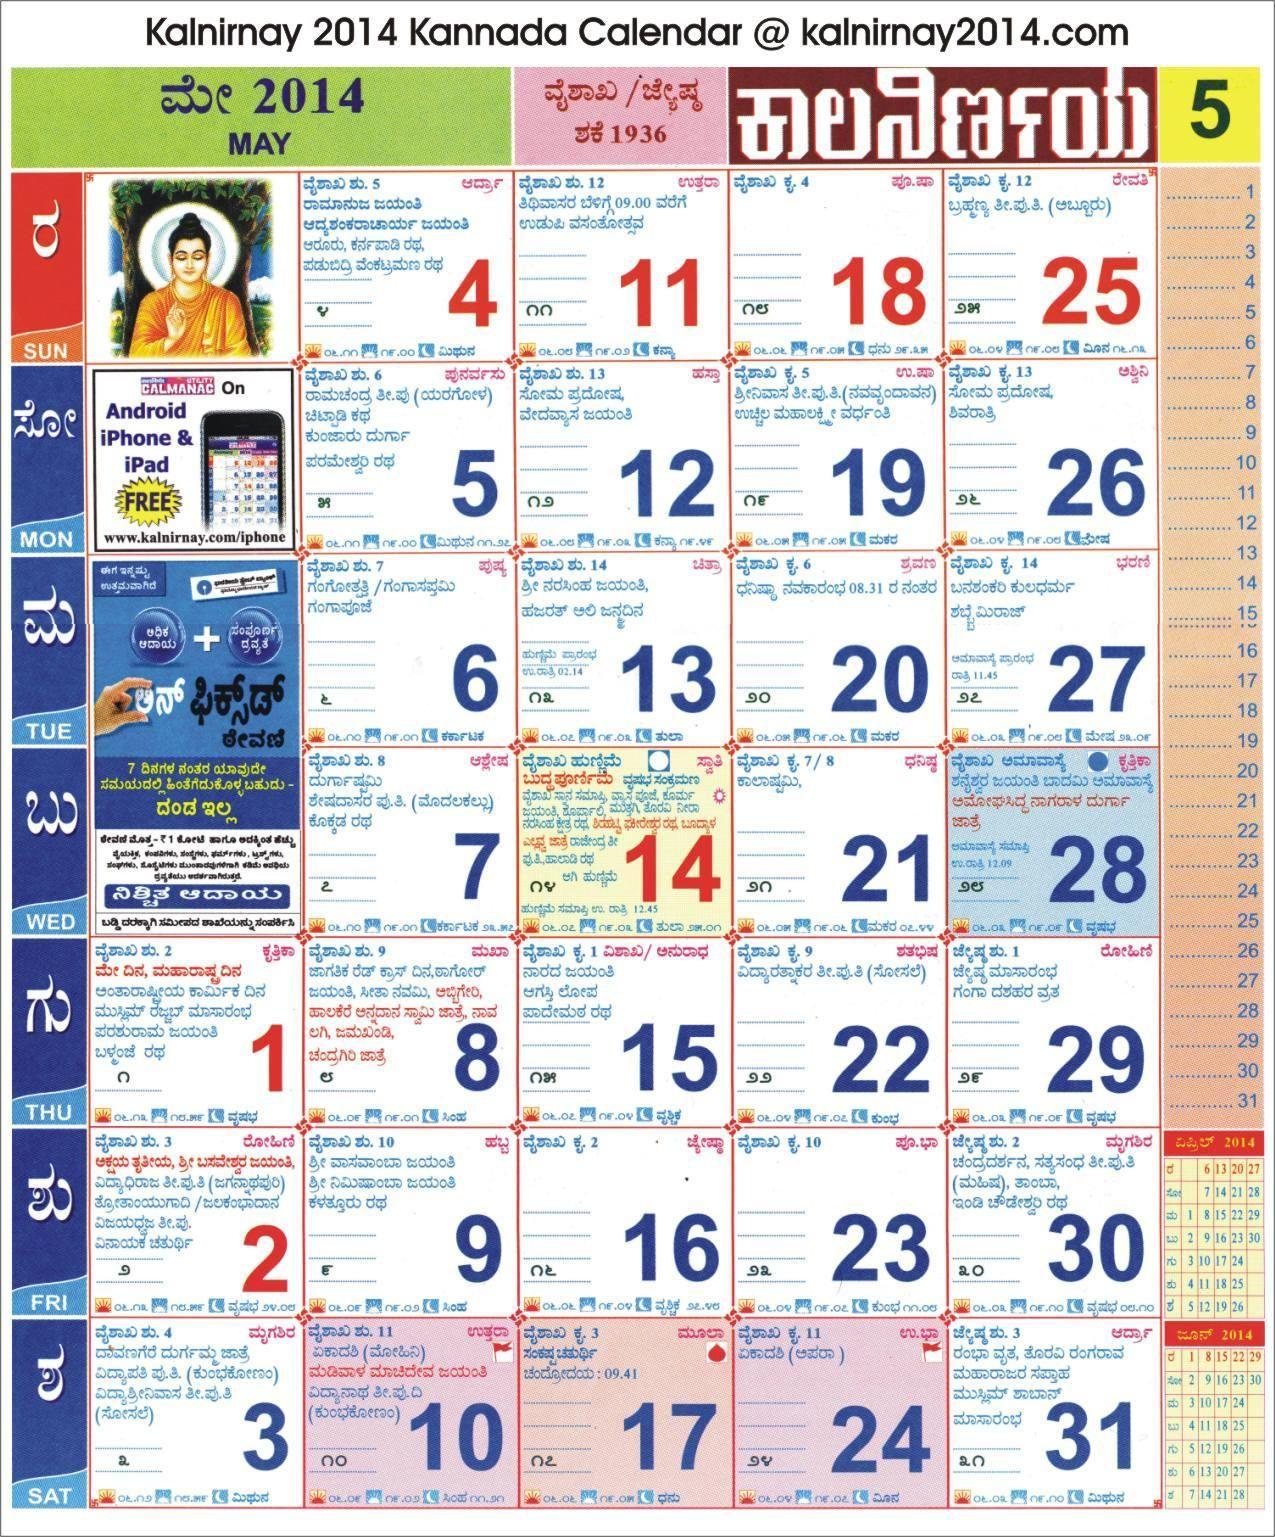 May 2014 Kannada Kalnirnay Calendar | Calendar, Website, October with regard to Kalnirnay May 2020